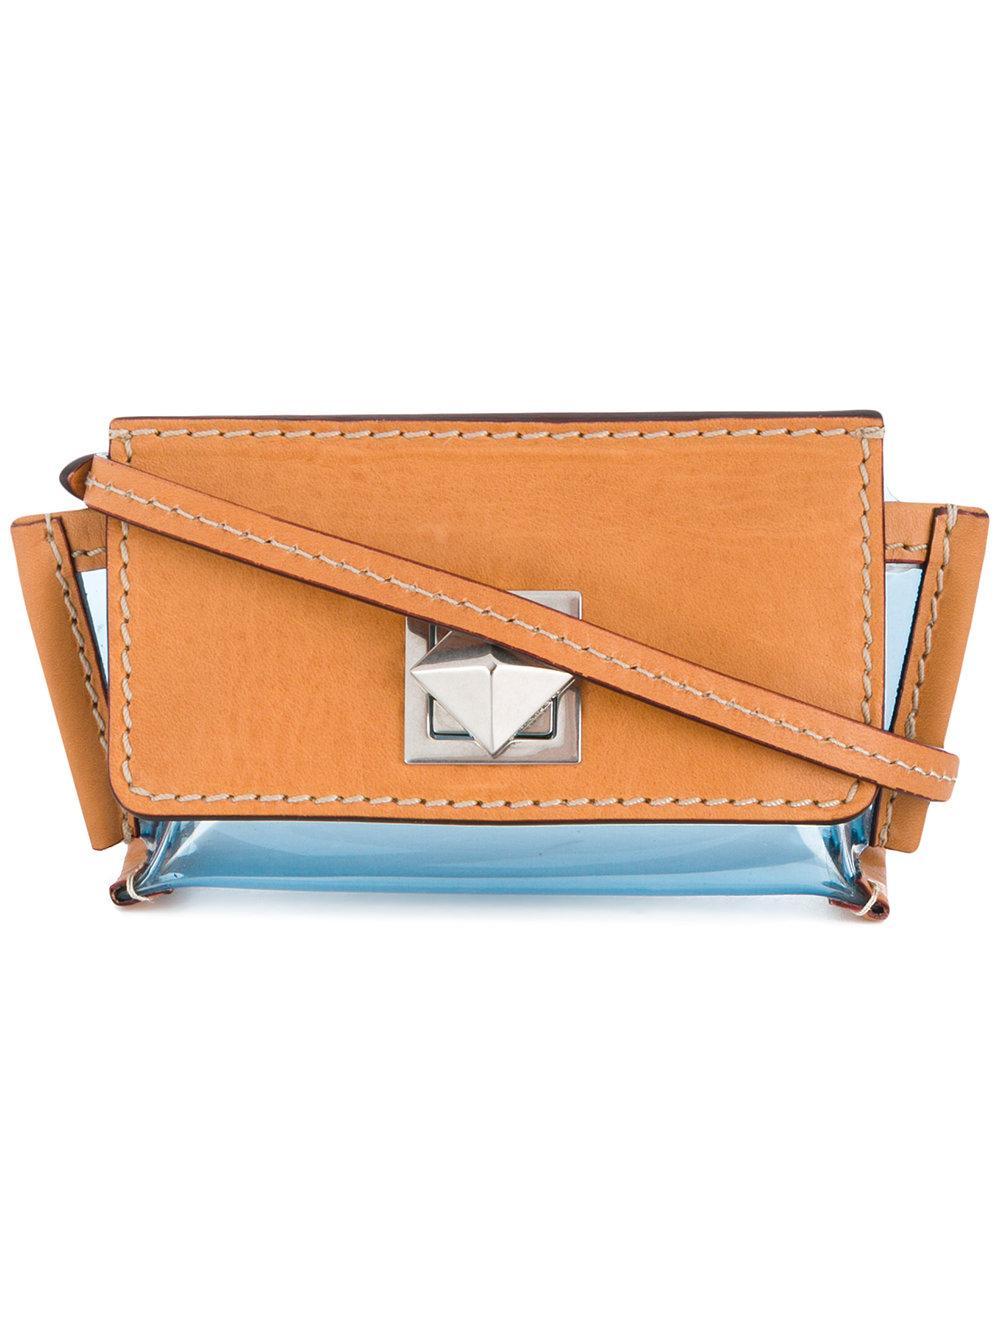 Sonia Rykiel Mini Crossbody Bag